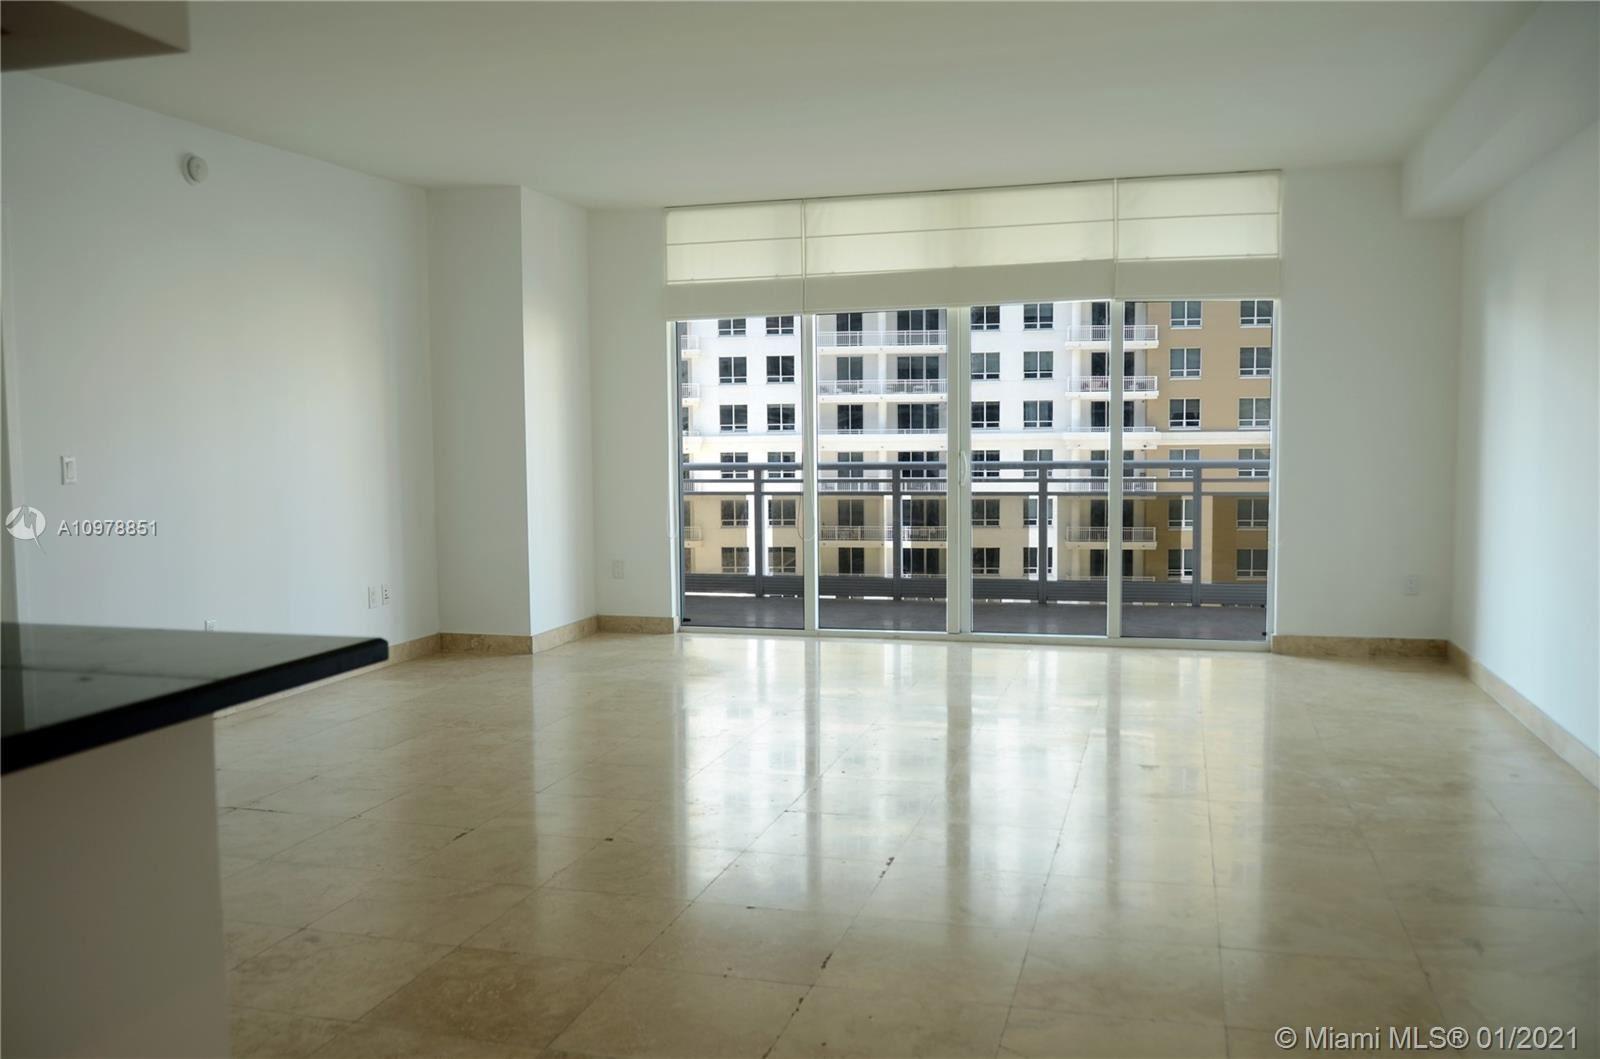 901 Brickell Key Blvd #1002, Miami, FL 33131 - #: A10978851